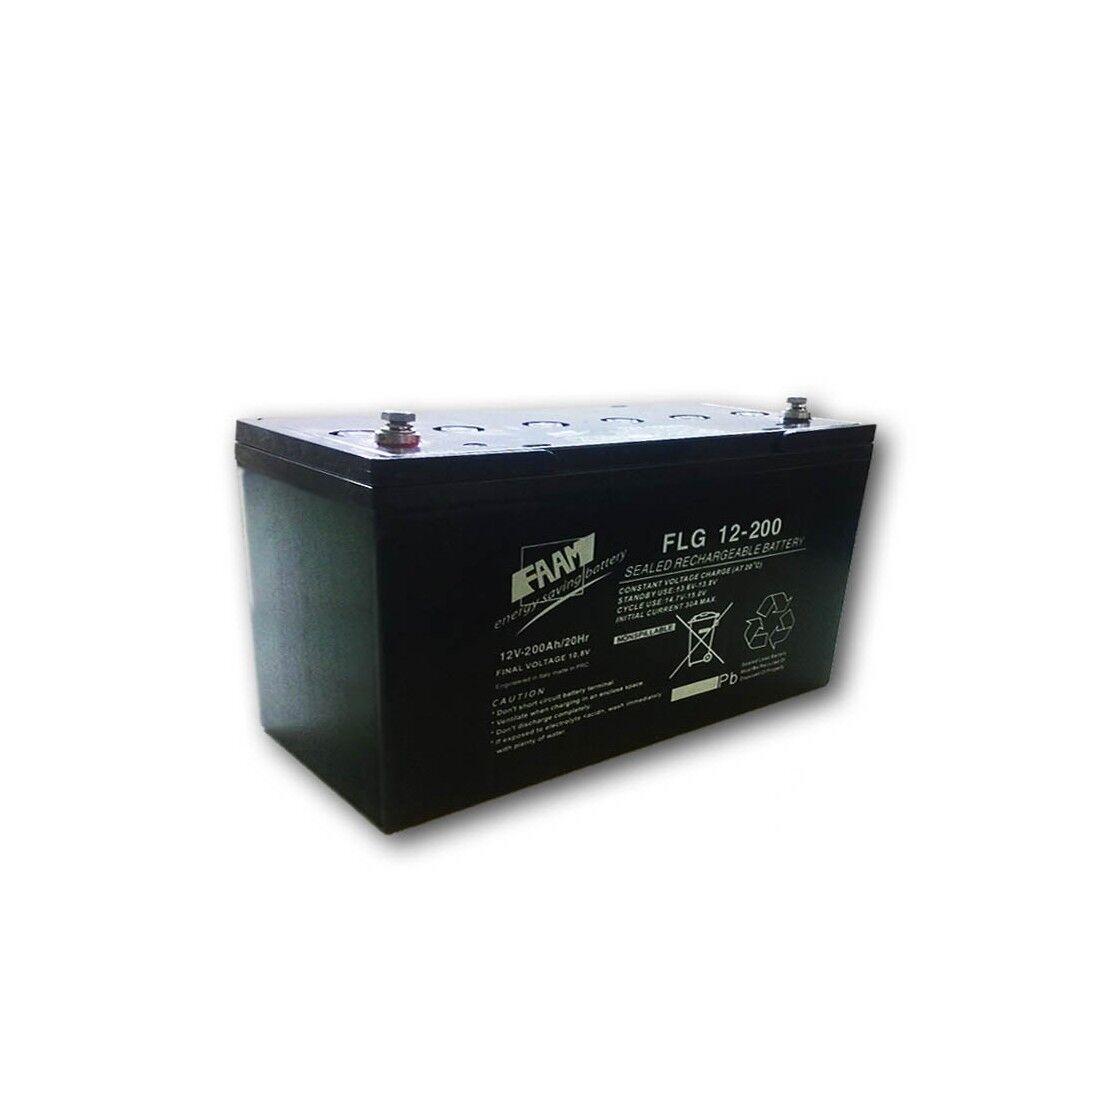 Faam Batteria Piombo GEL 200Ah 12V ermetica scarica lenta   1200 cicli   FAAM